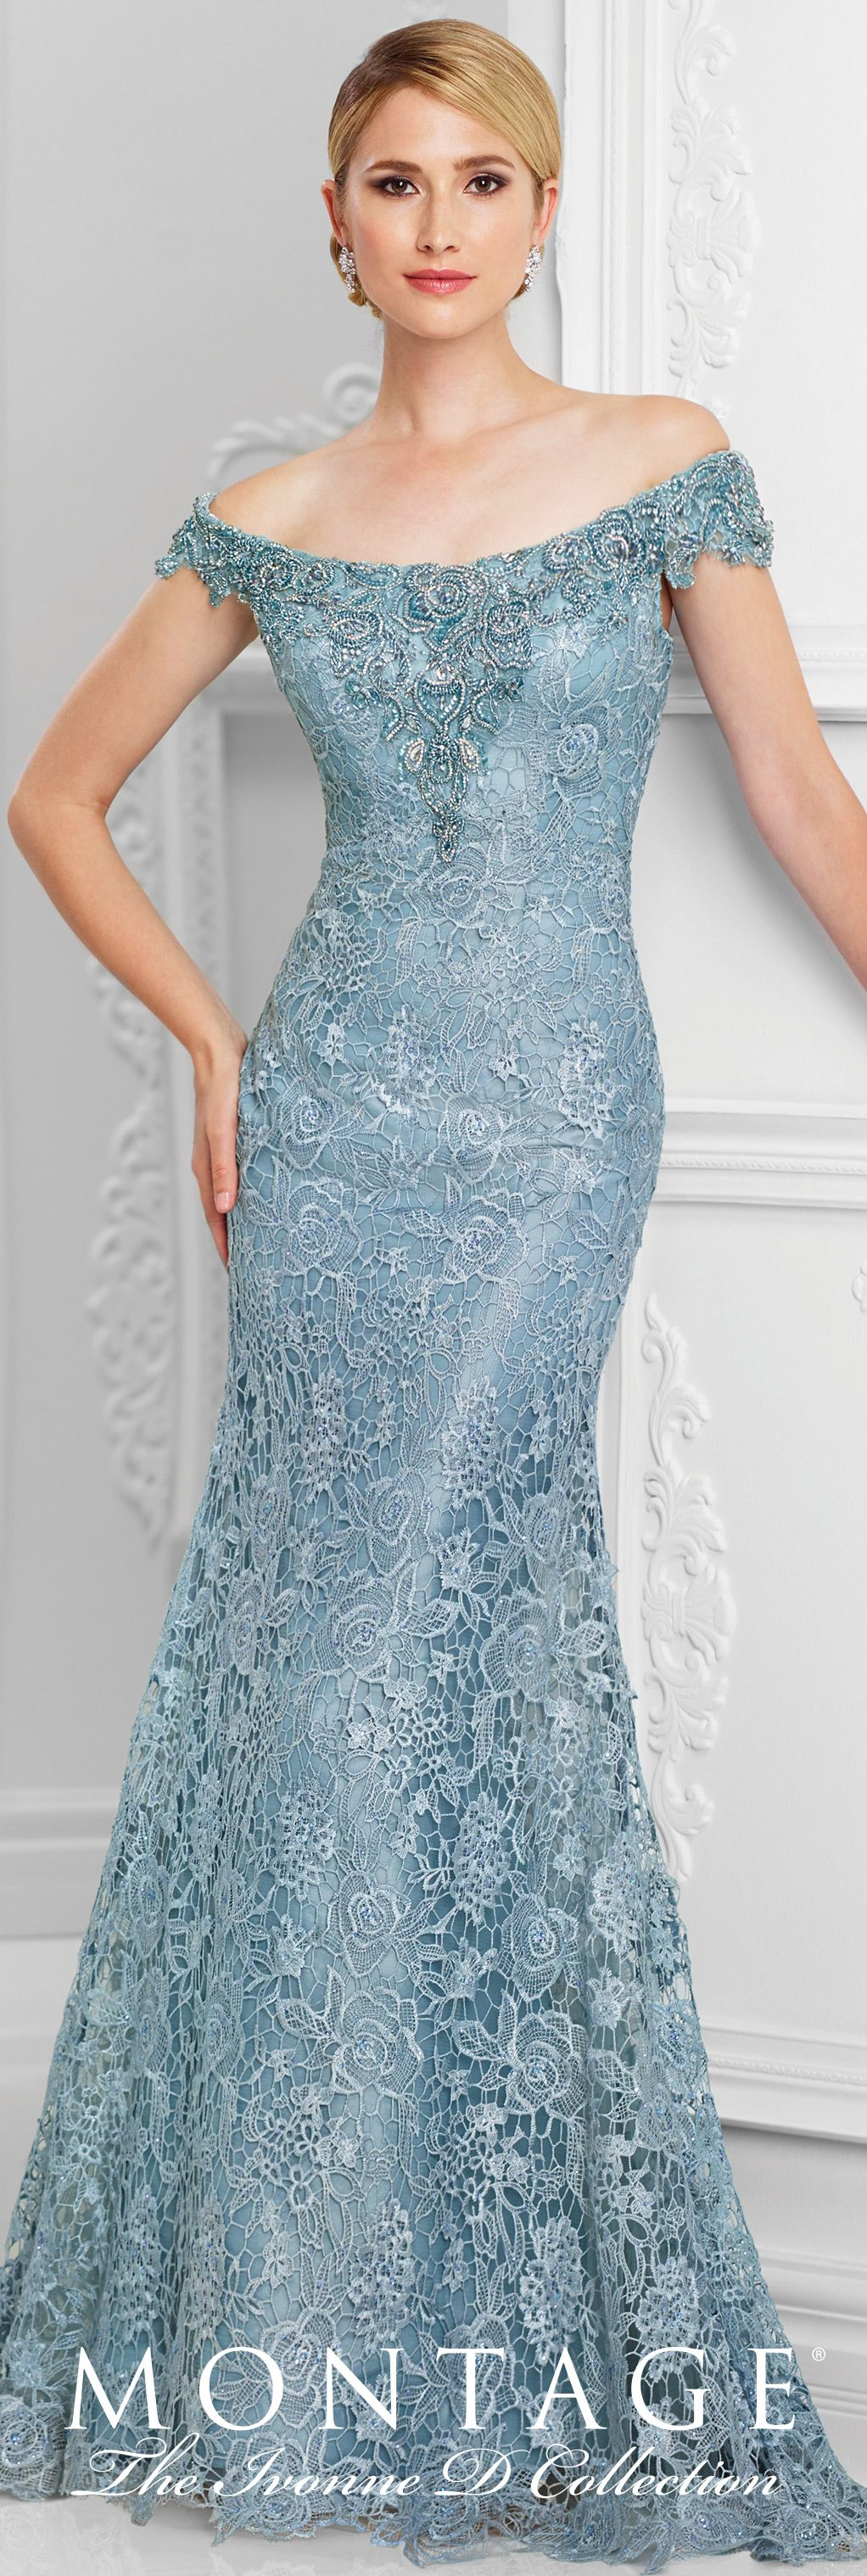 Ivonne d evening dresses d wardrobe pinterest dresses